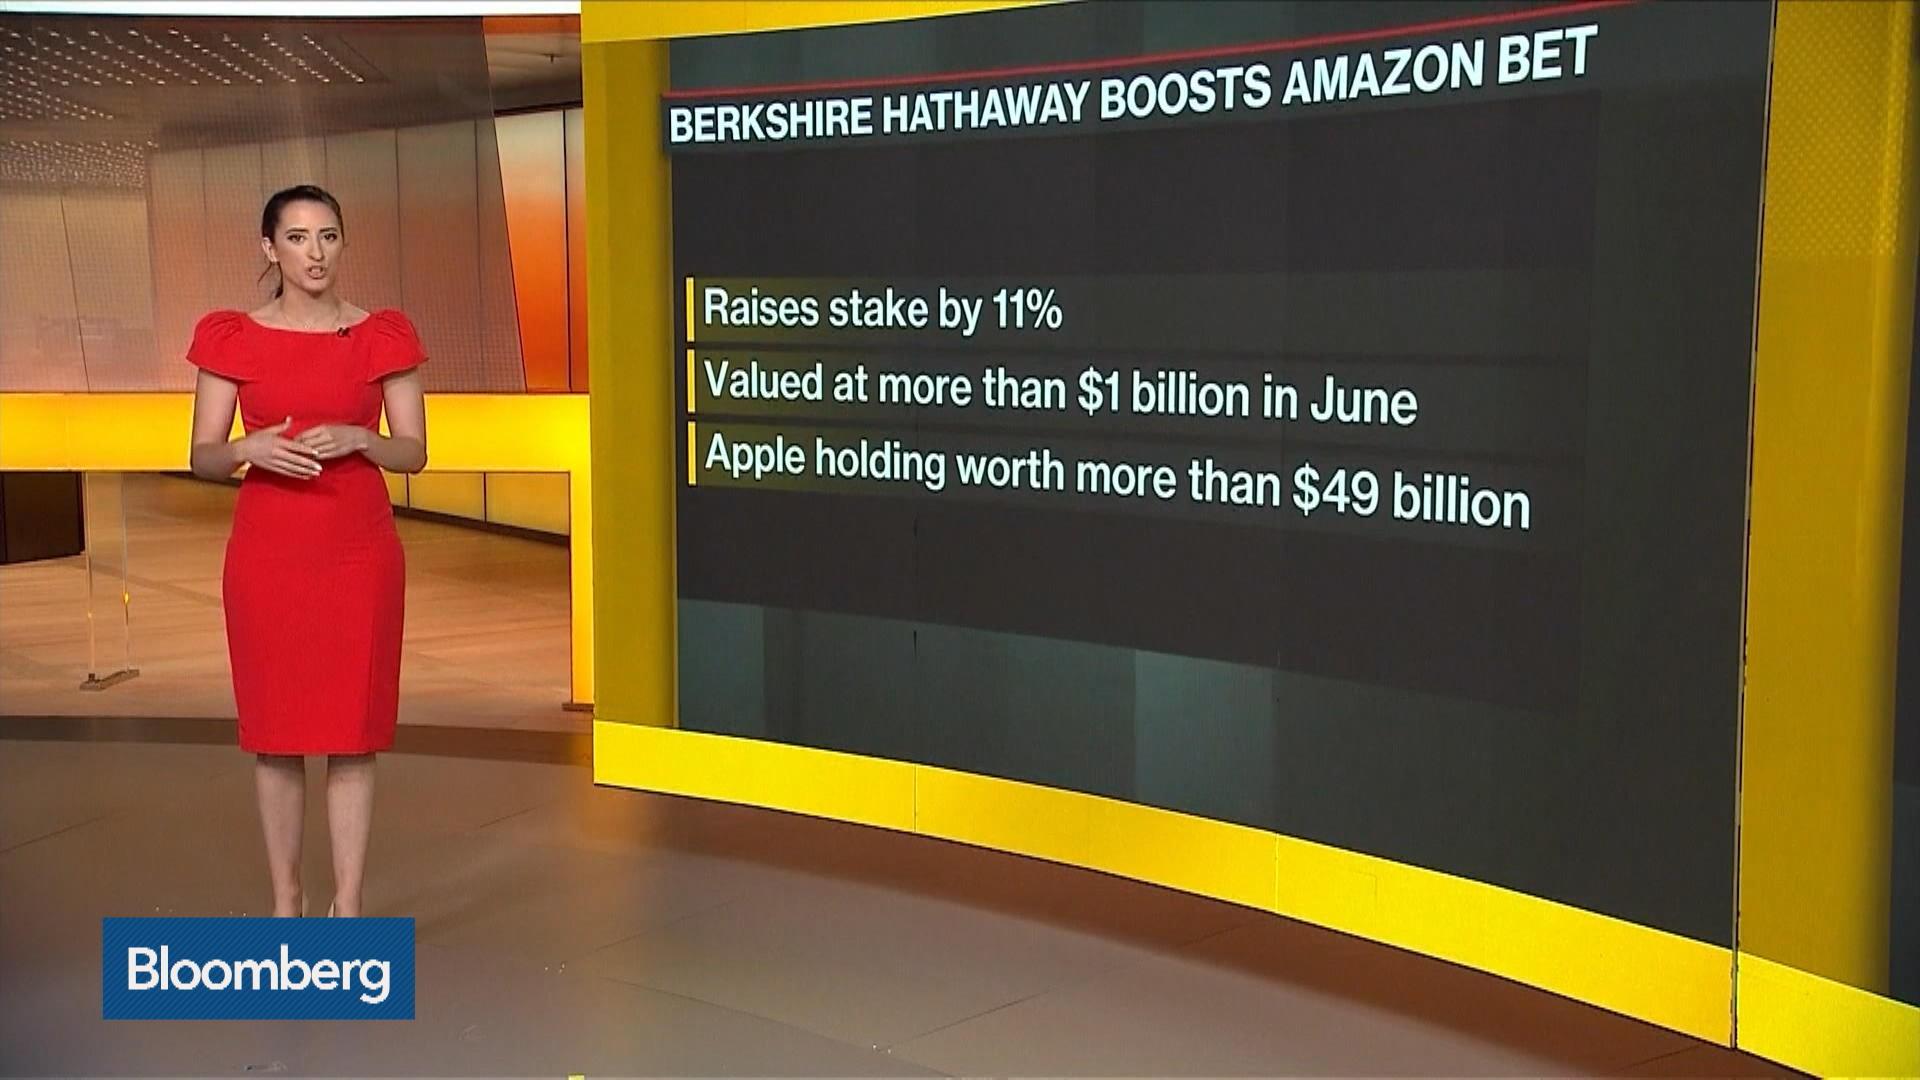 Berkshire Hathaway Boosts Amazon Bet